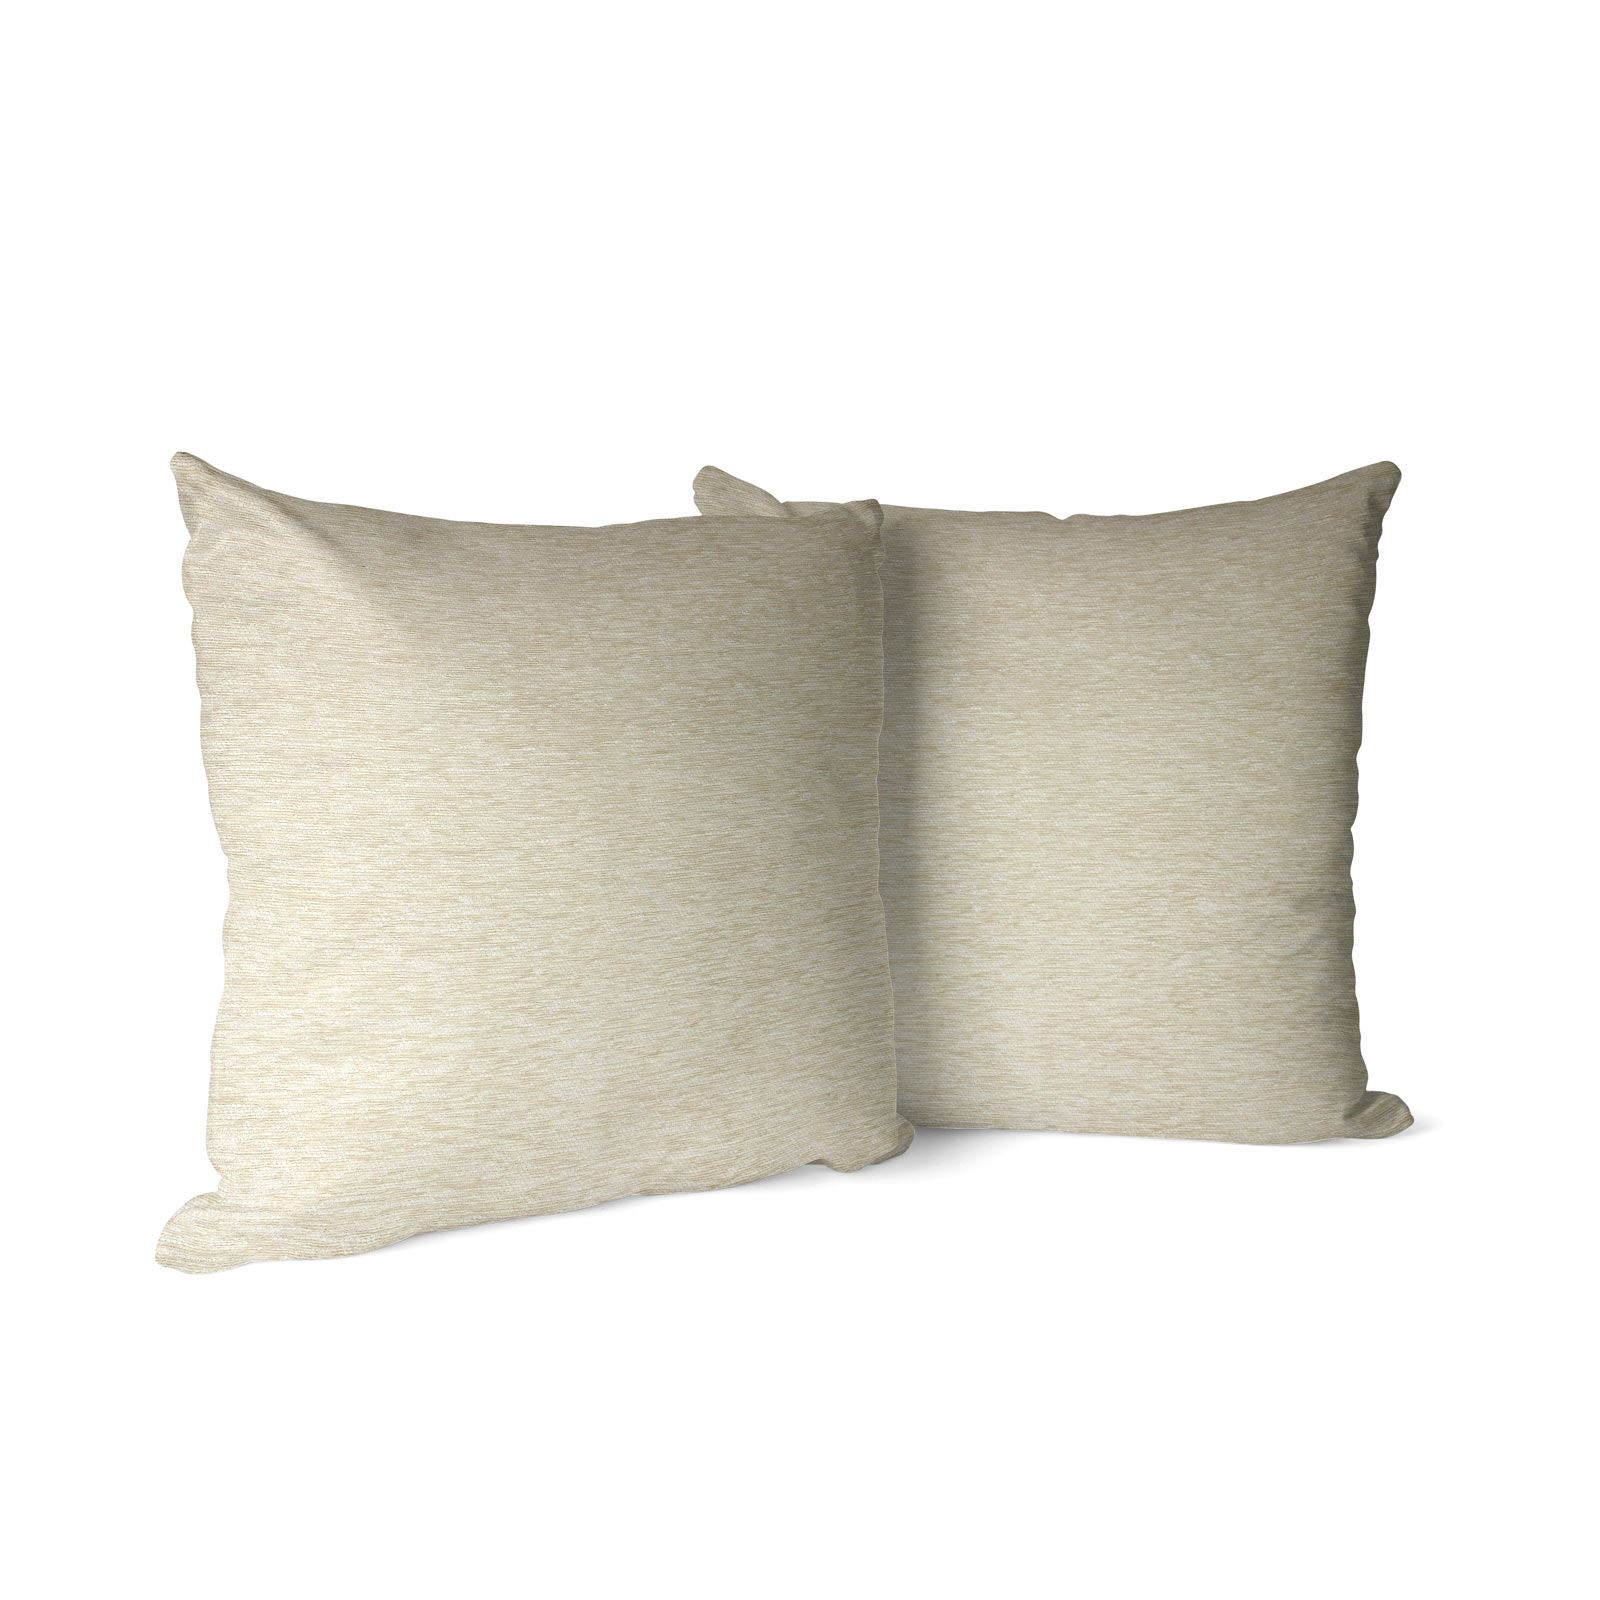 Set-of-2-Chenille-Cushion-Covers-Luxury-Plain-Cushions-Cover-Pairs-18-034-x-18-034 thumbnail 34